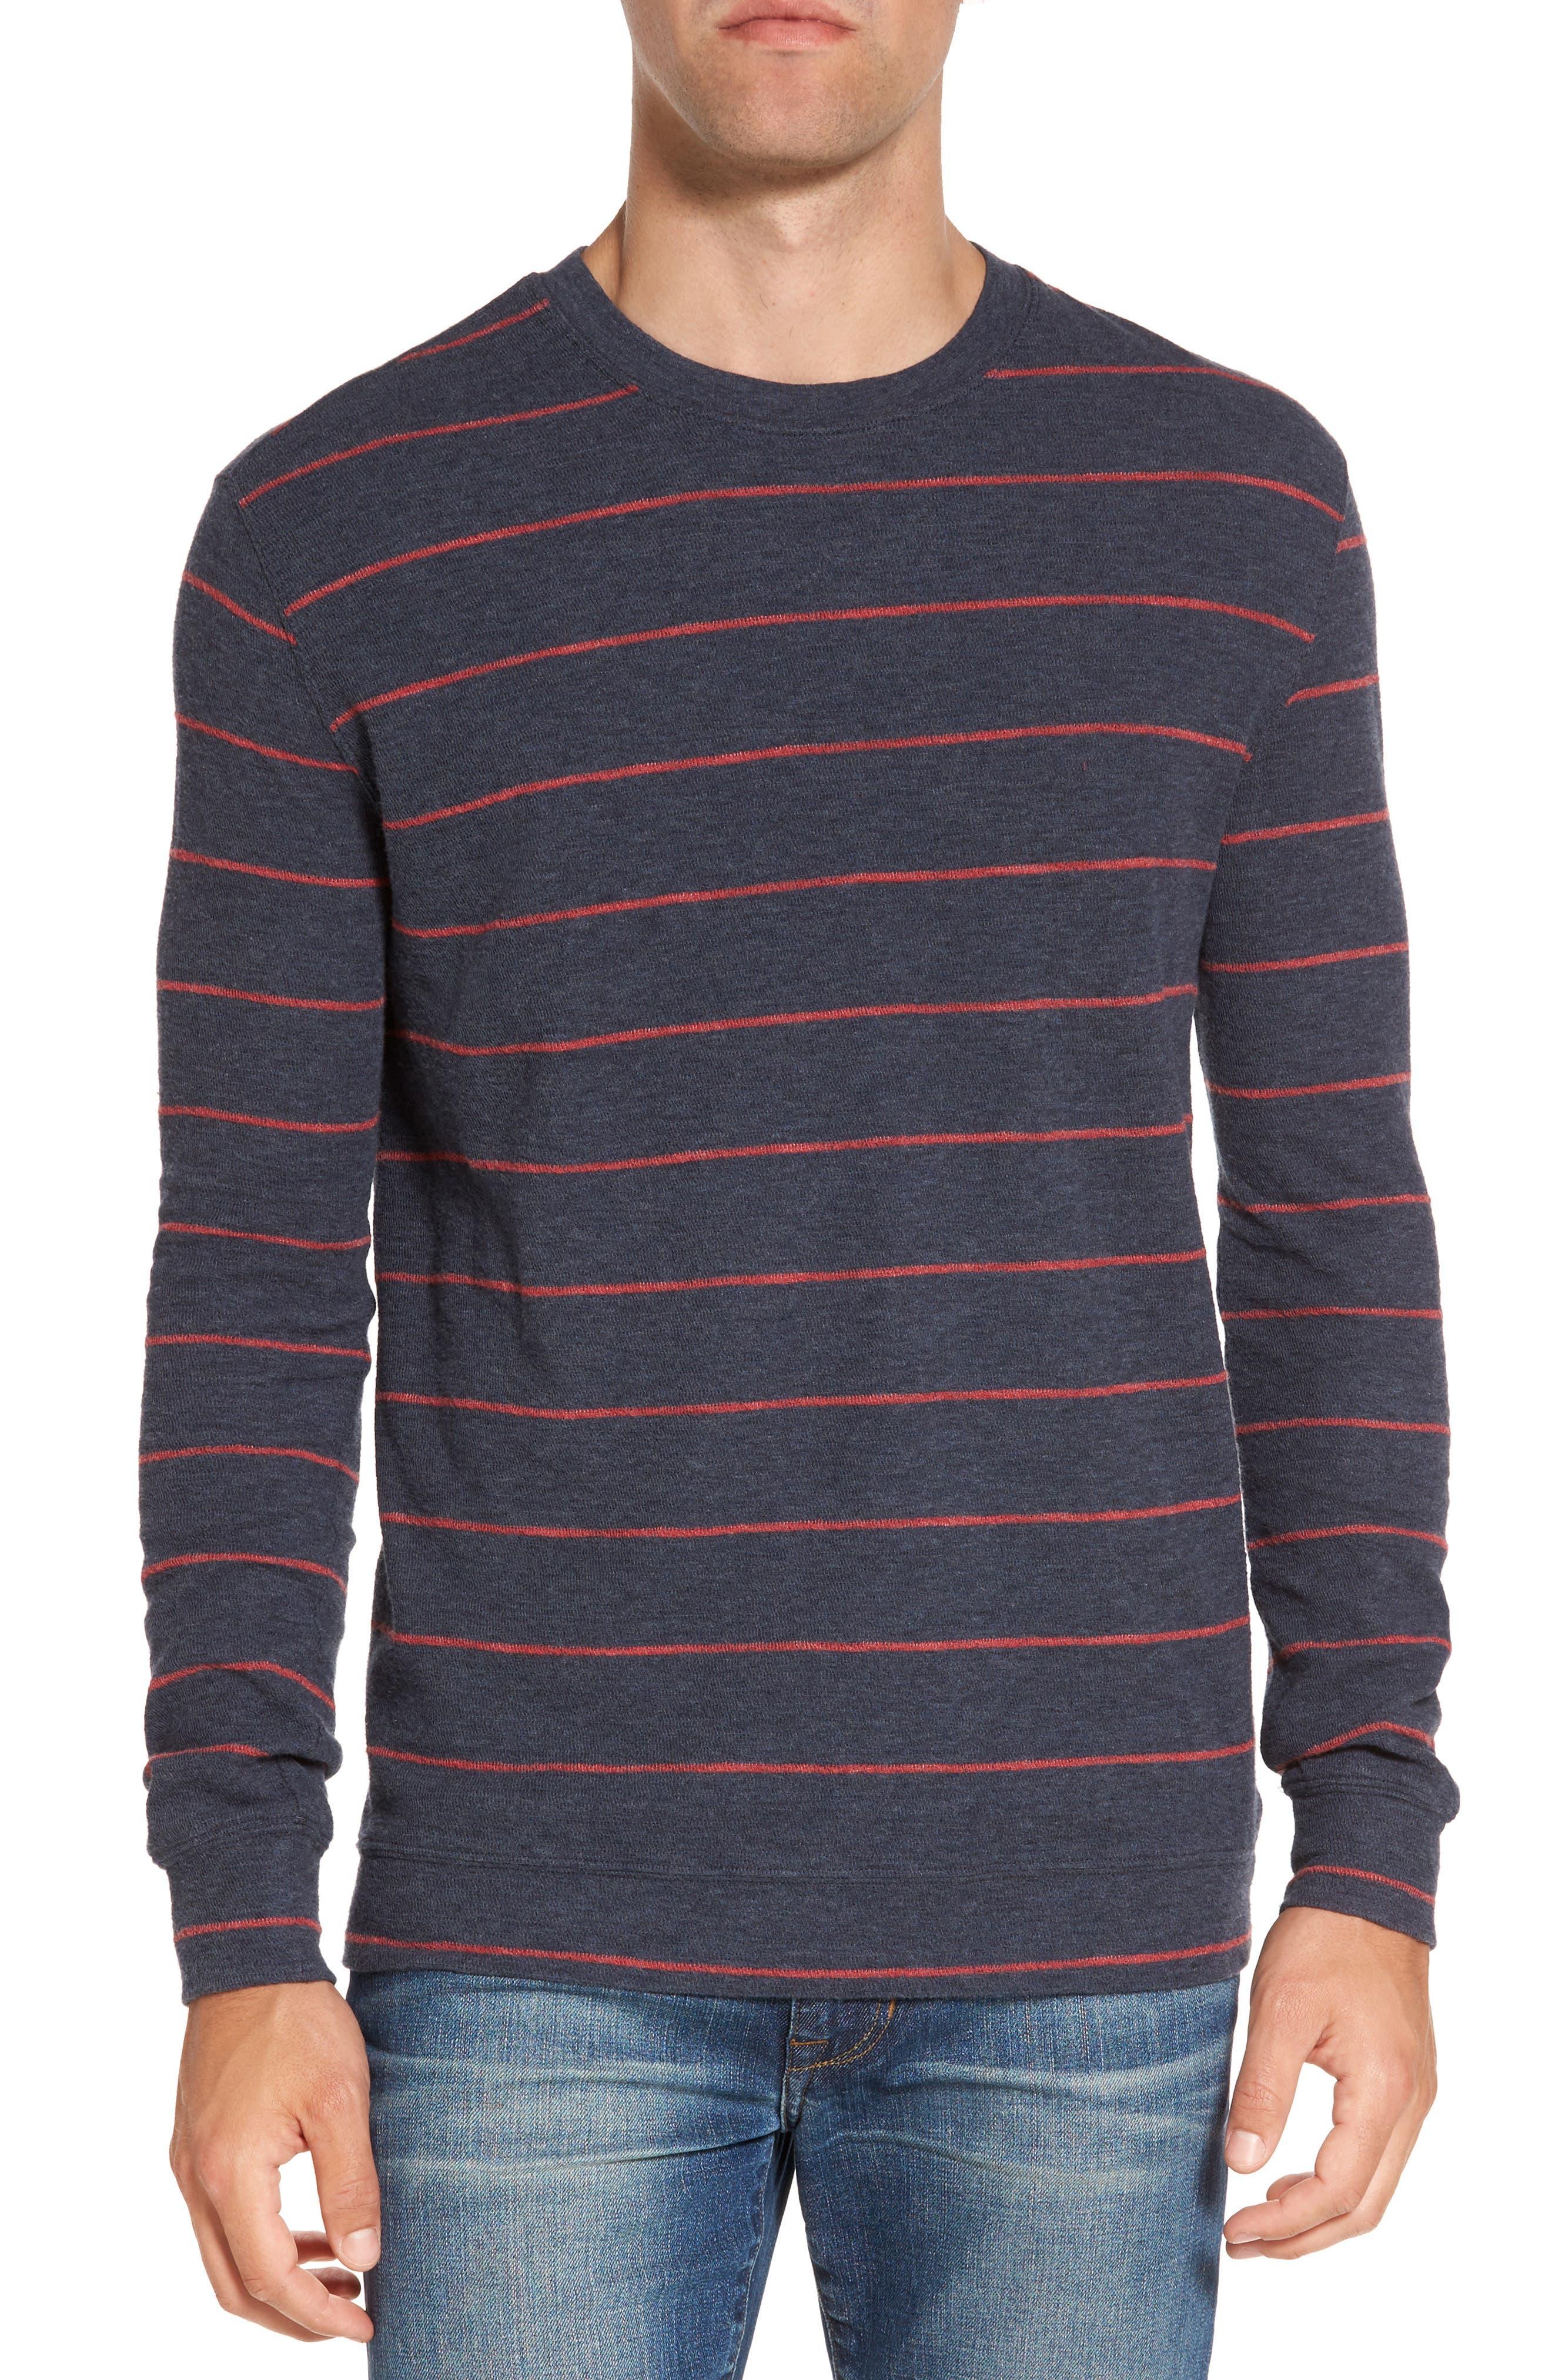 Baird Stripe Crewneck Sweatshirt,                             Main thumbnail 1, color,                             412